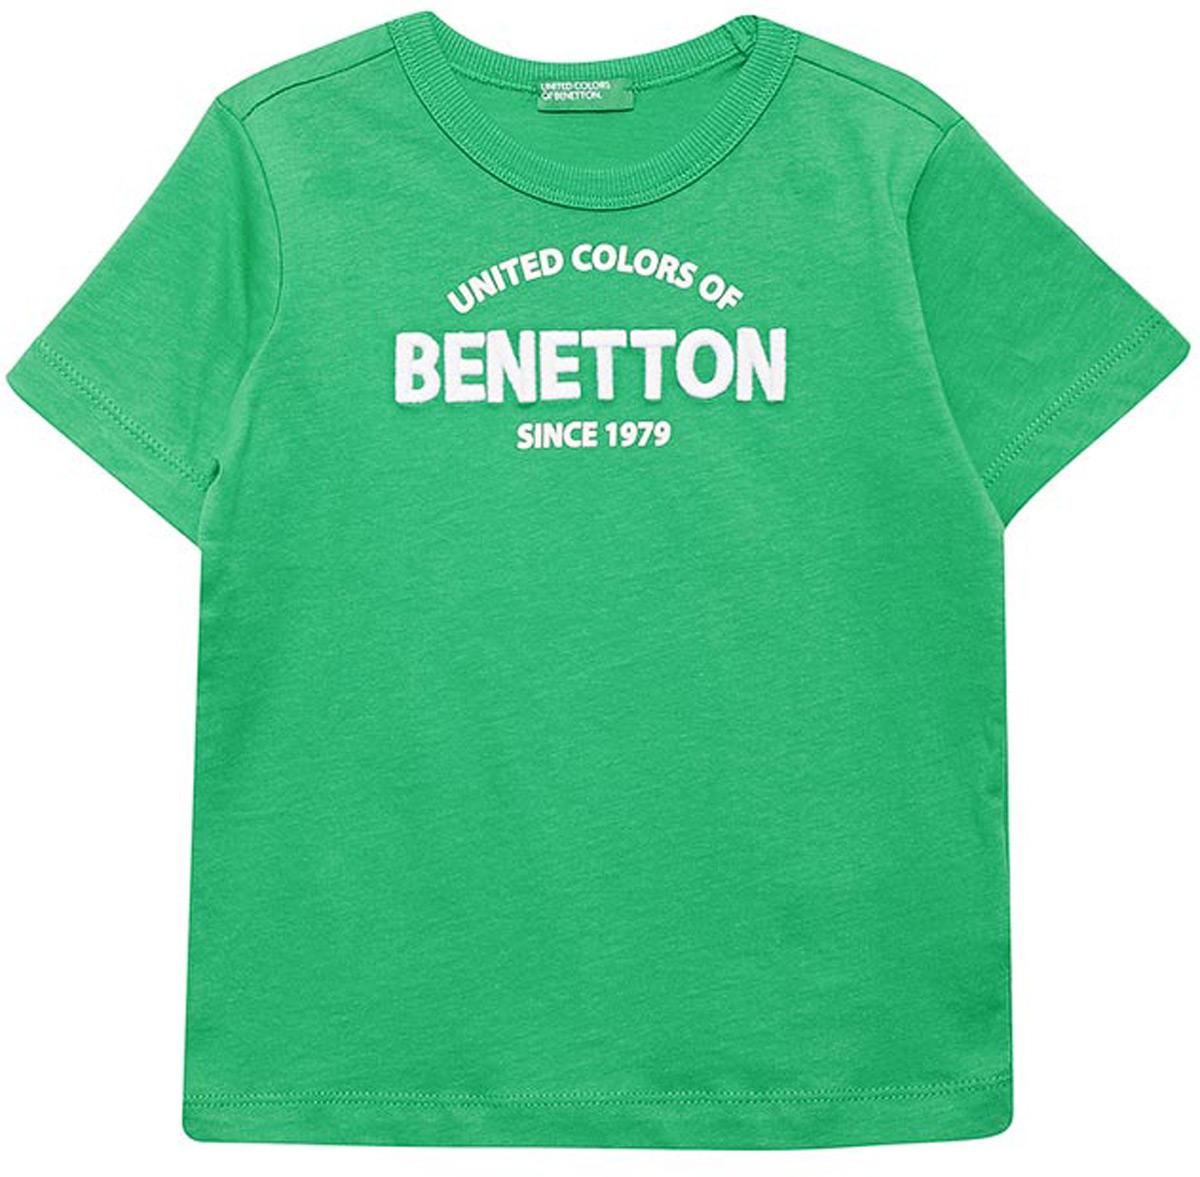 Футболка для мальчиков United Colors of Benetton, цвет: зеленый. 3096C11XR_108. Размер 1103096C11XR_108